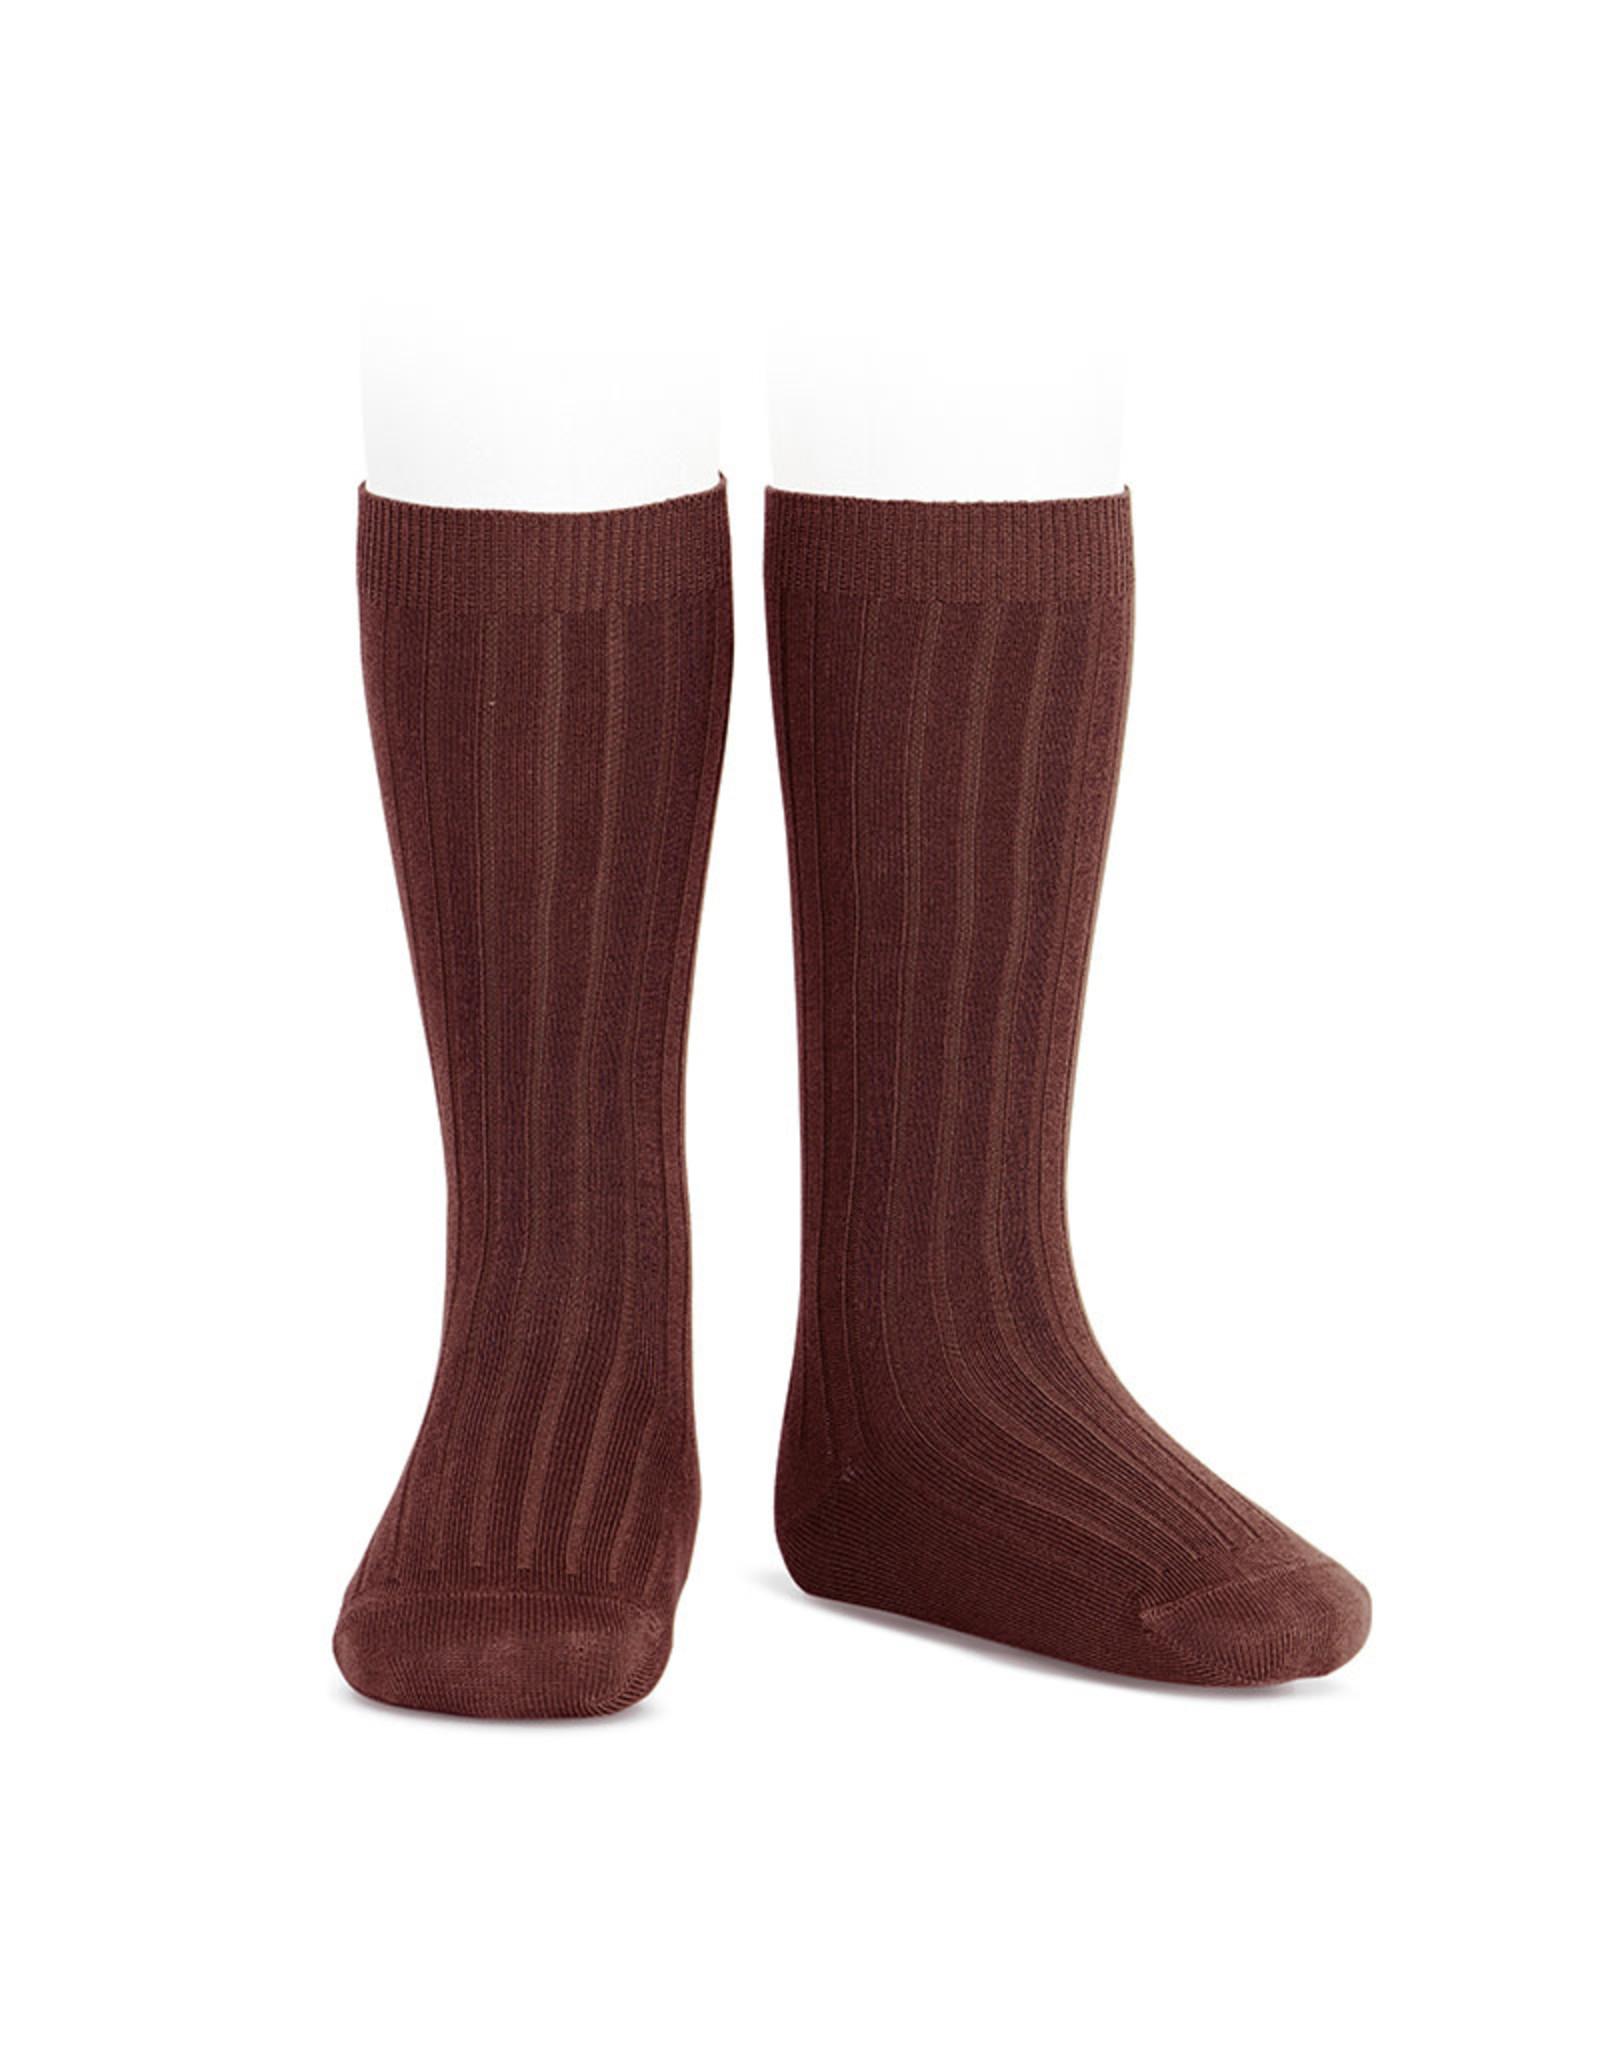 CONDOR Cauldron Ribbed Knee Socks